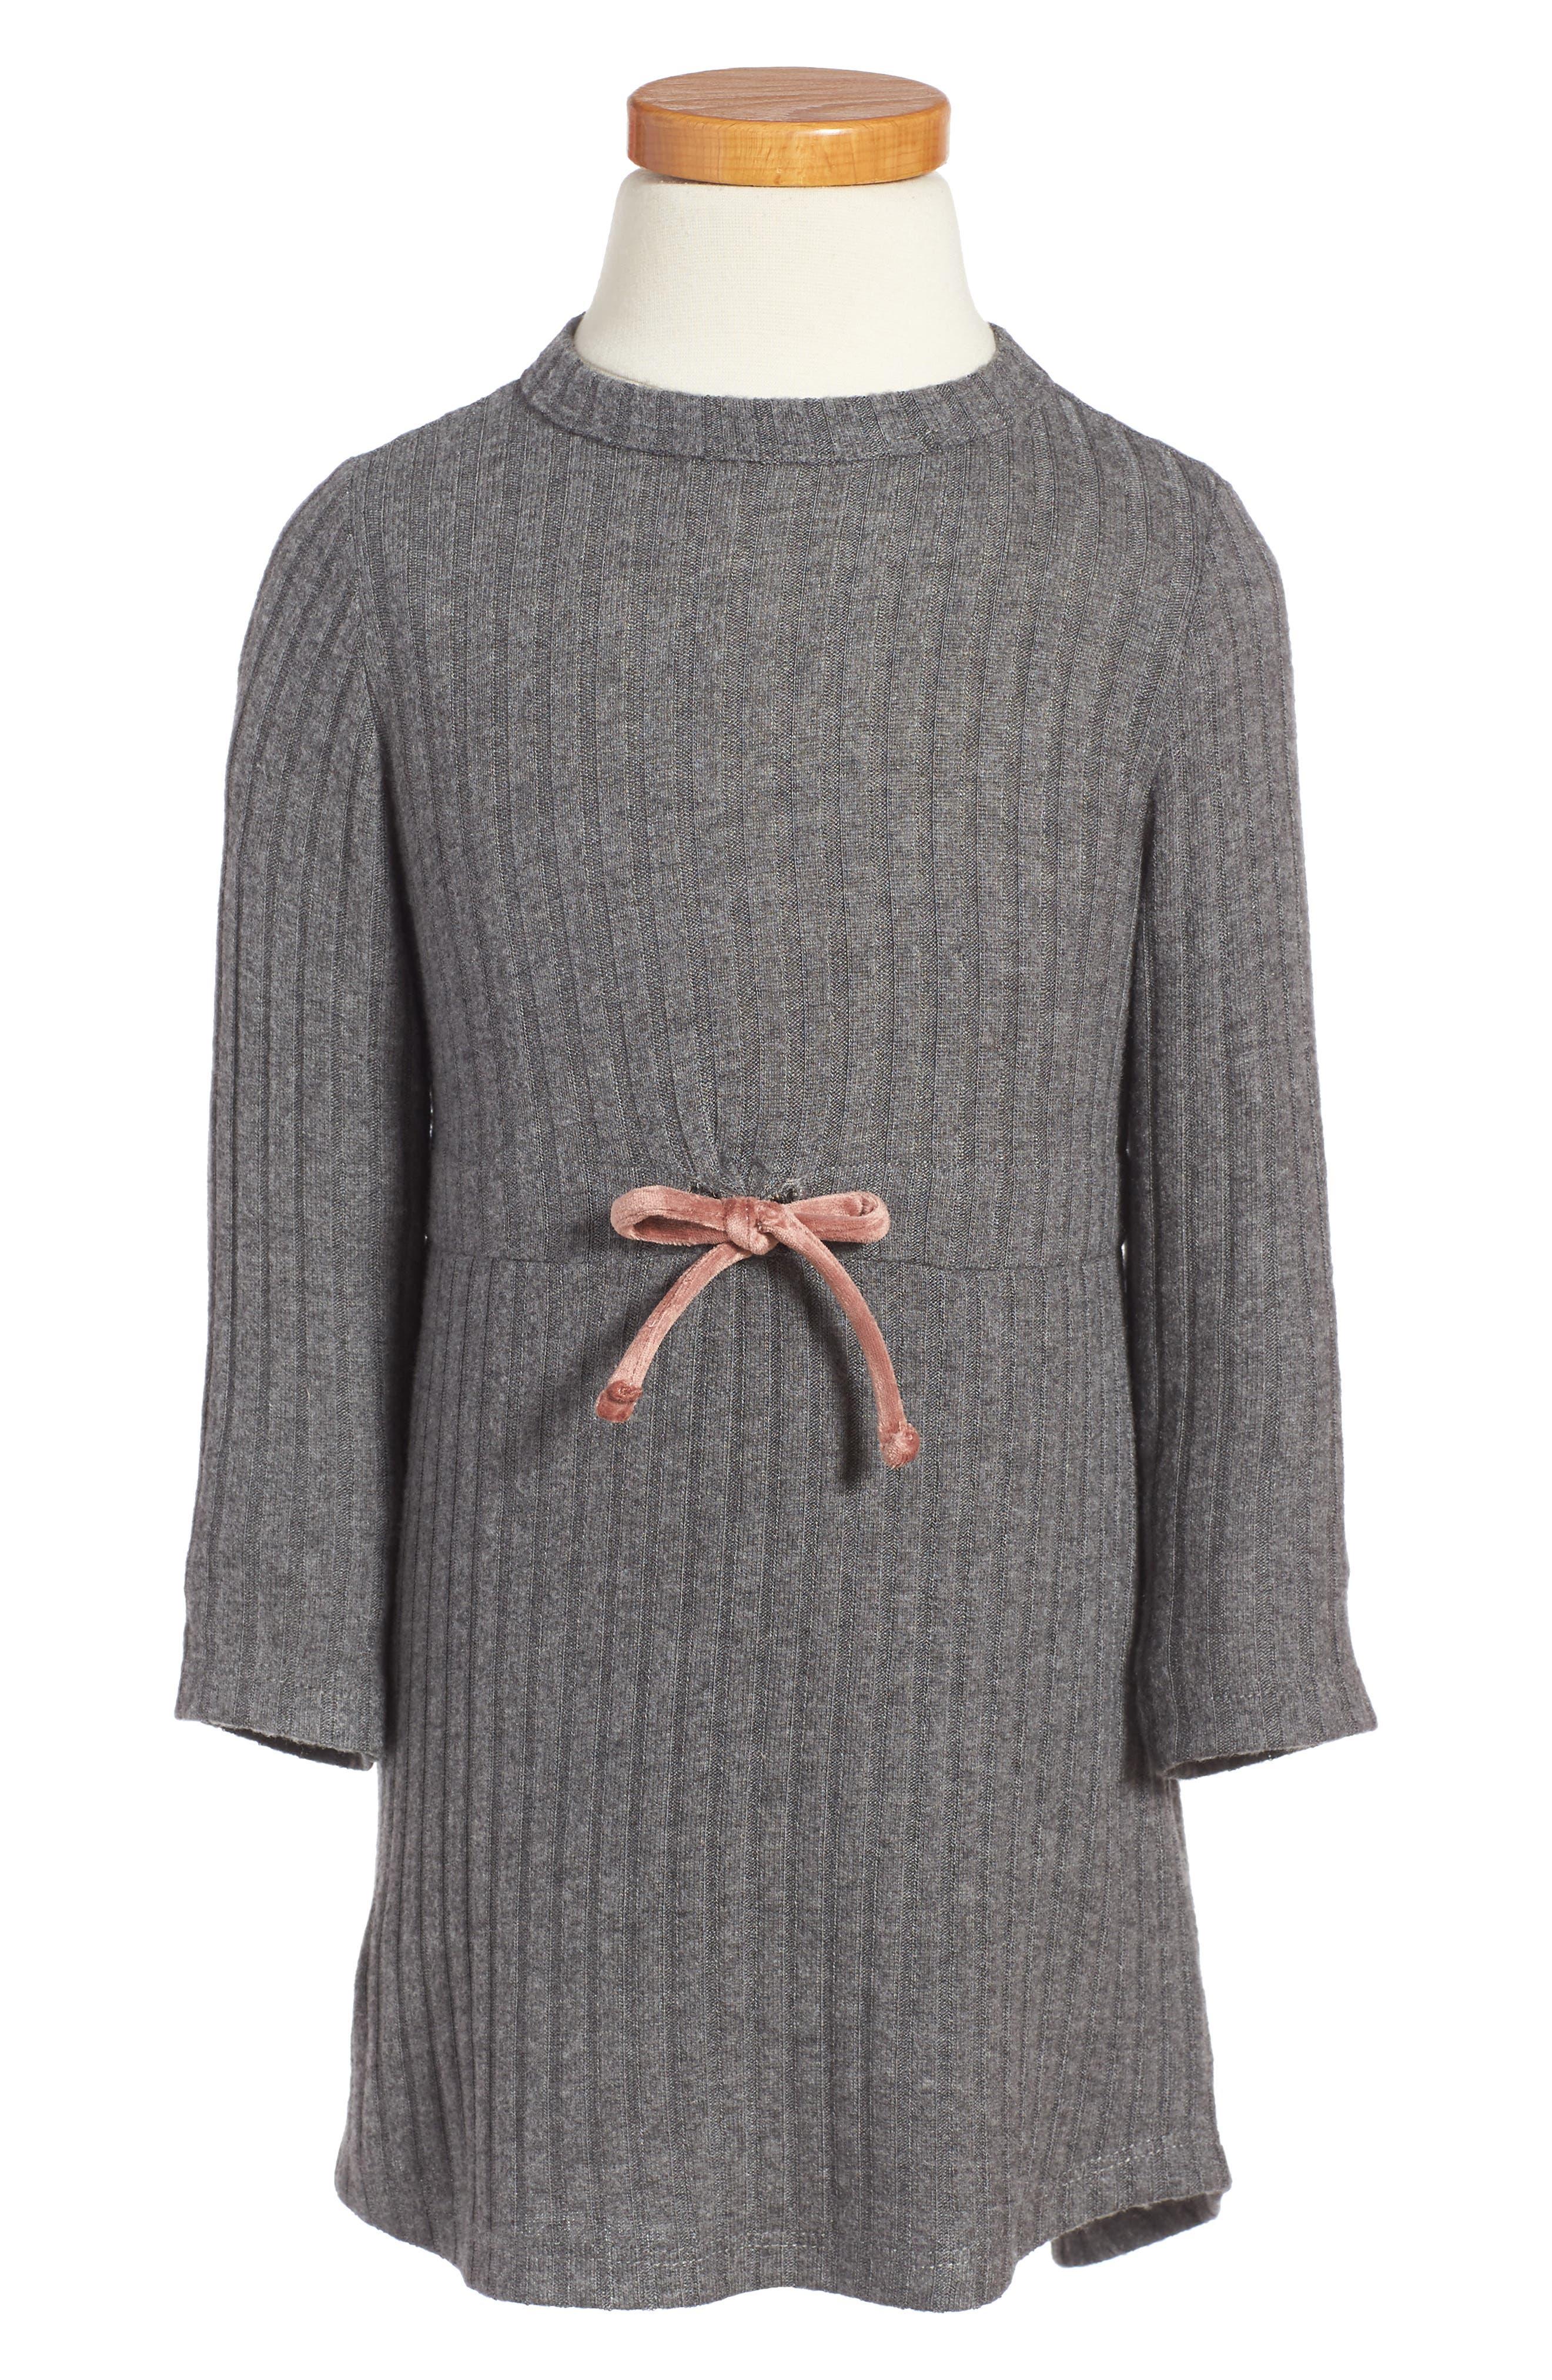 BERU Ellana Ribbed Sweater Dress